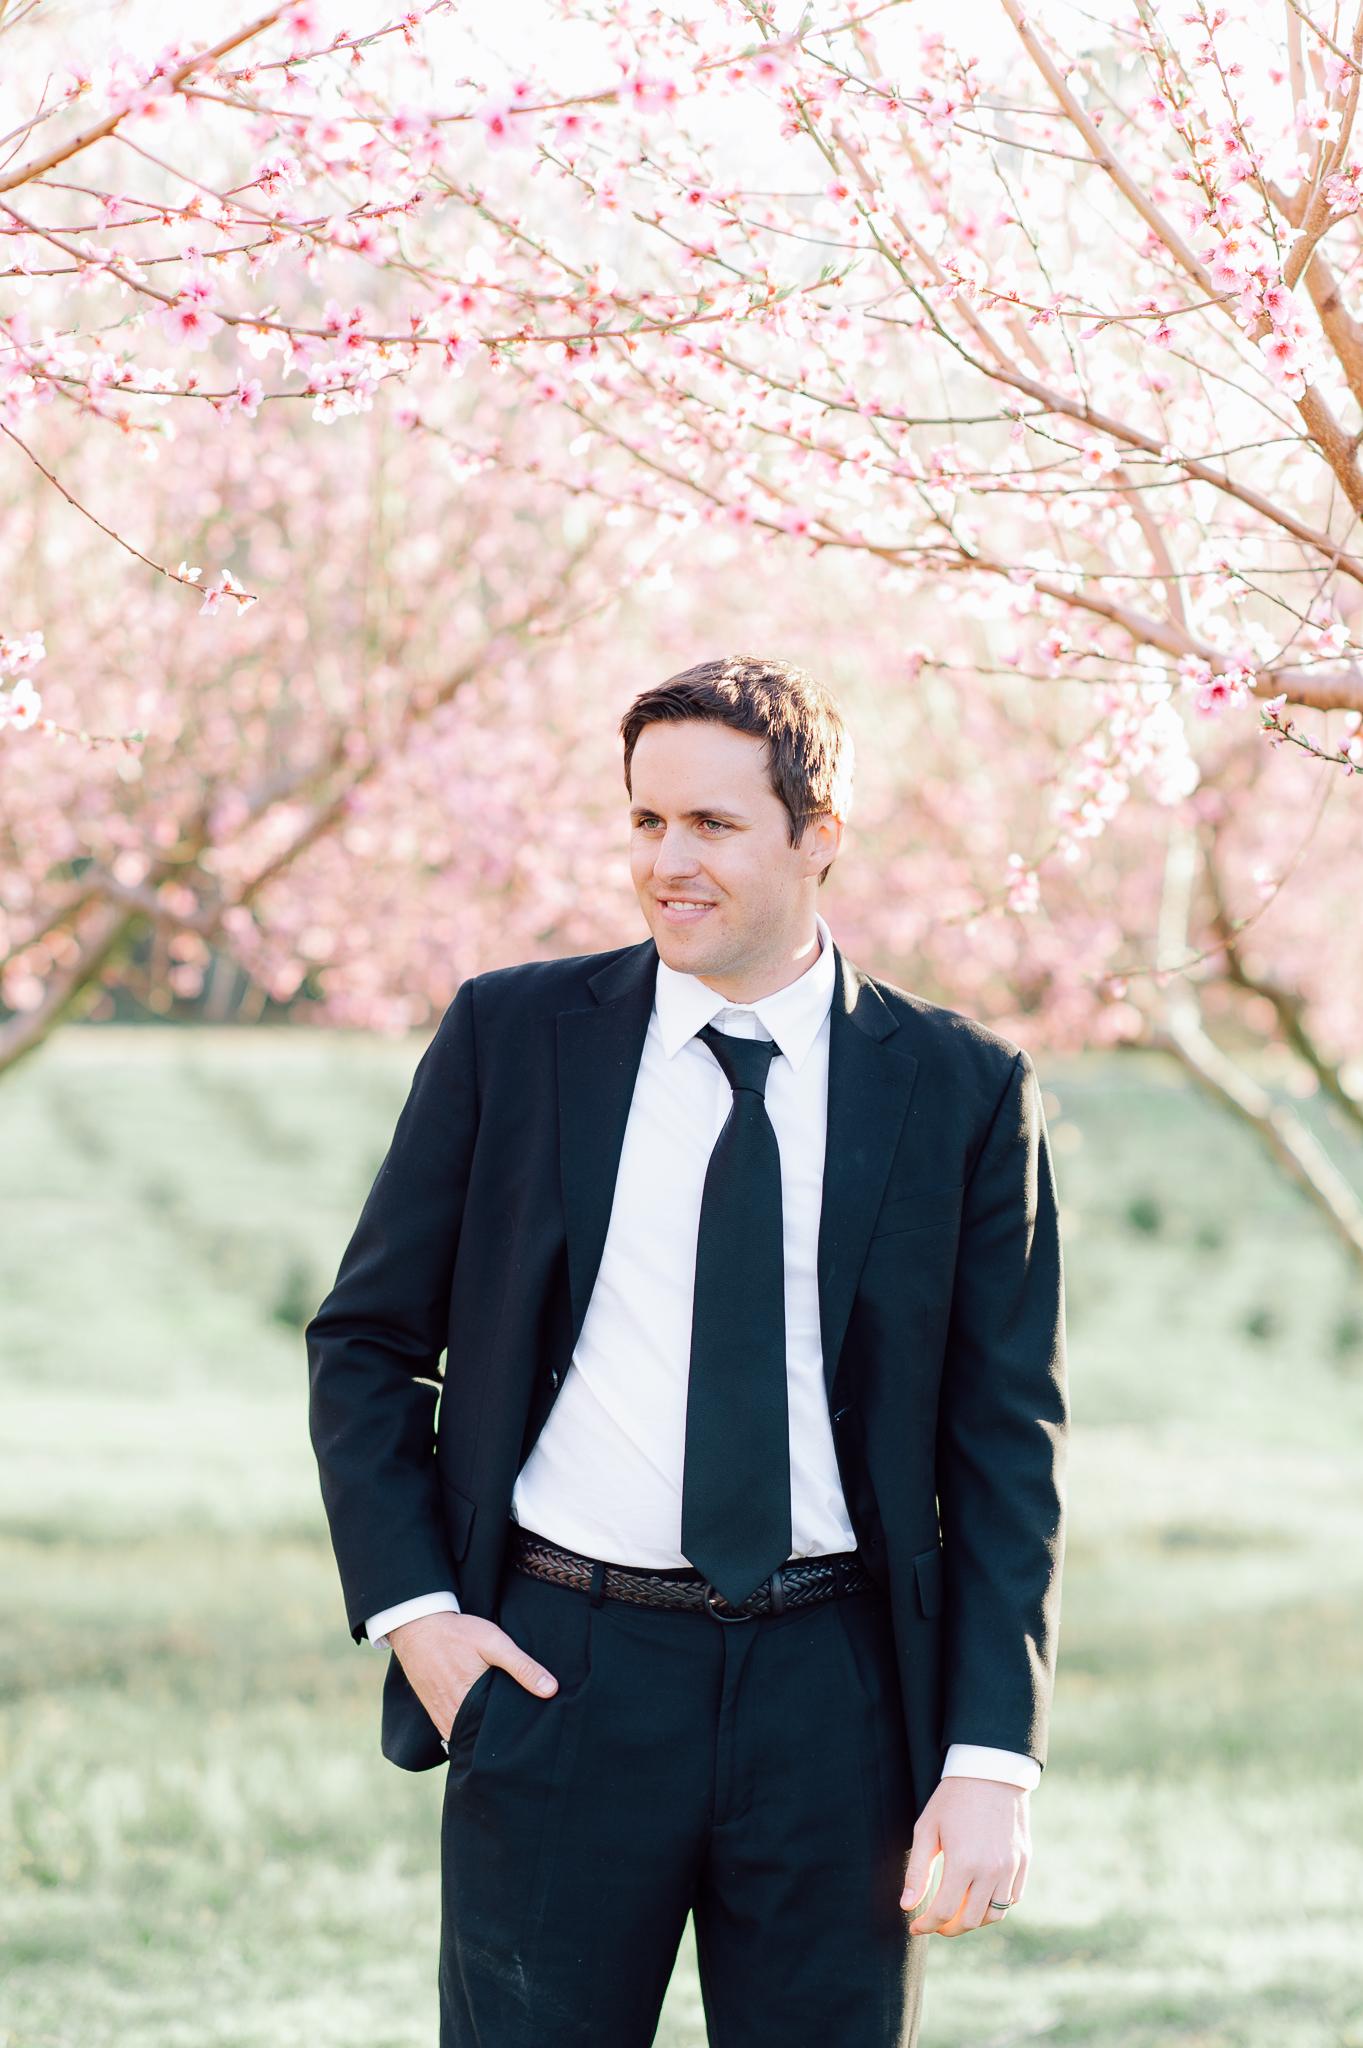 springwedding_cherryblossoms_virginiaphotographer_youseephotography_styledshoot (590).jpg